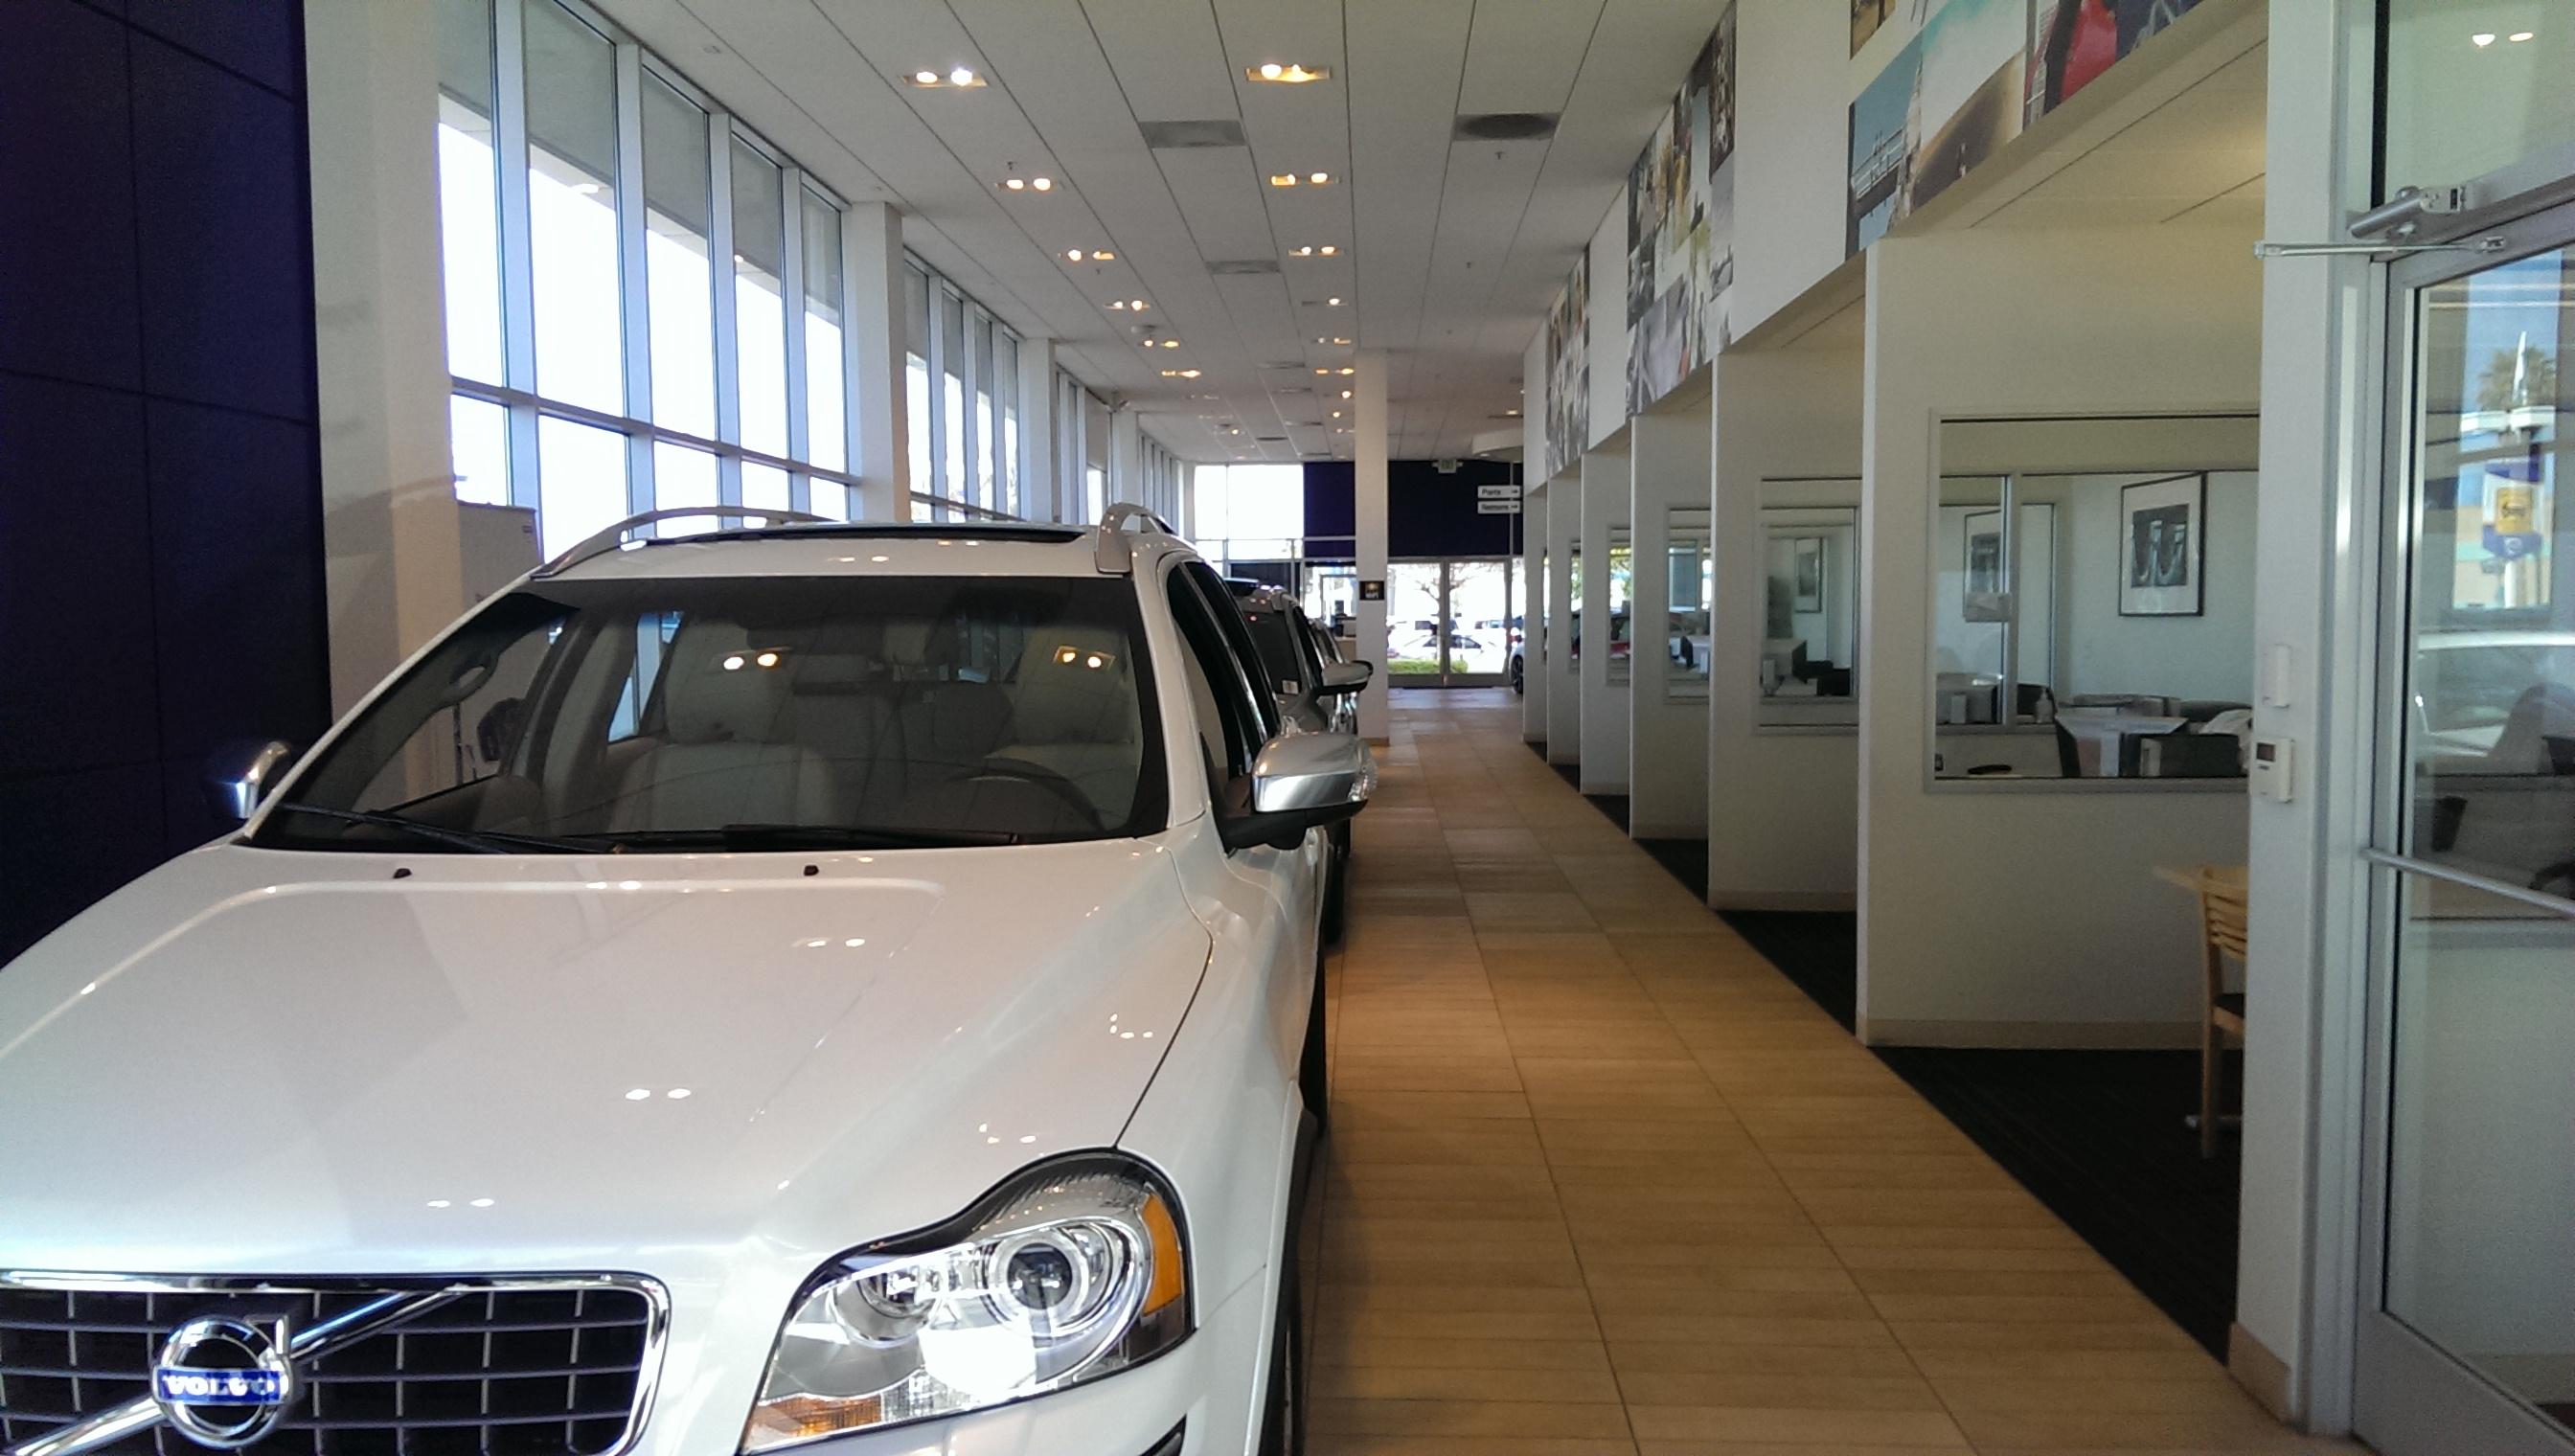 San Leandro Nissan Specials >> AutoNation Volvo Cars San Jose, San Jose California (CA) - LocalDatabase.com